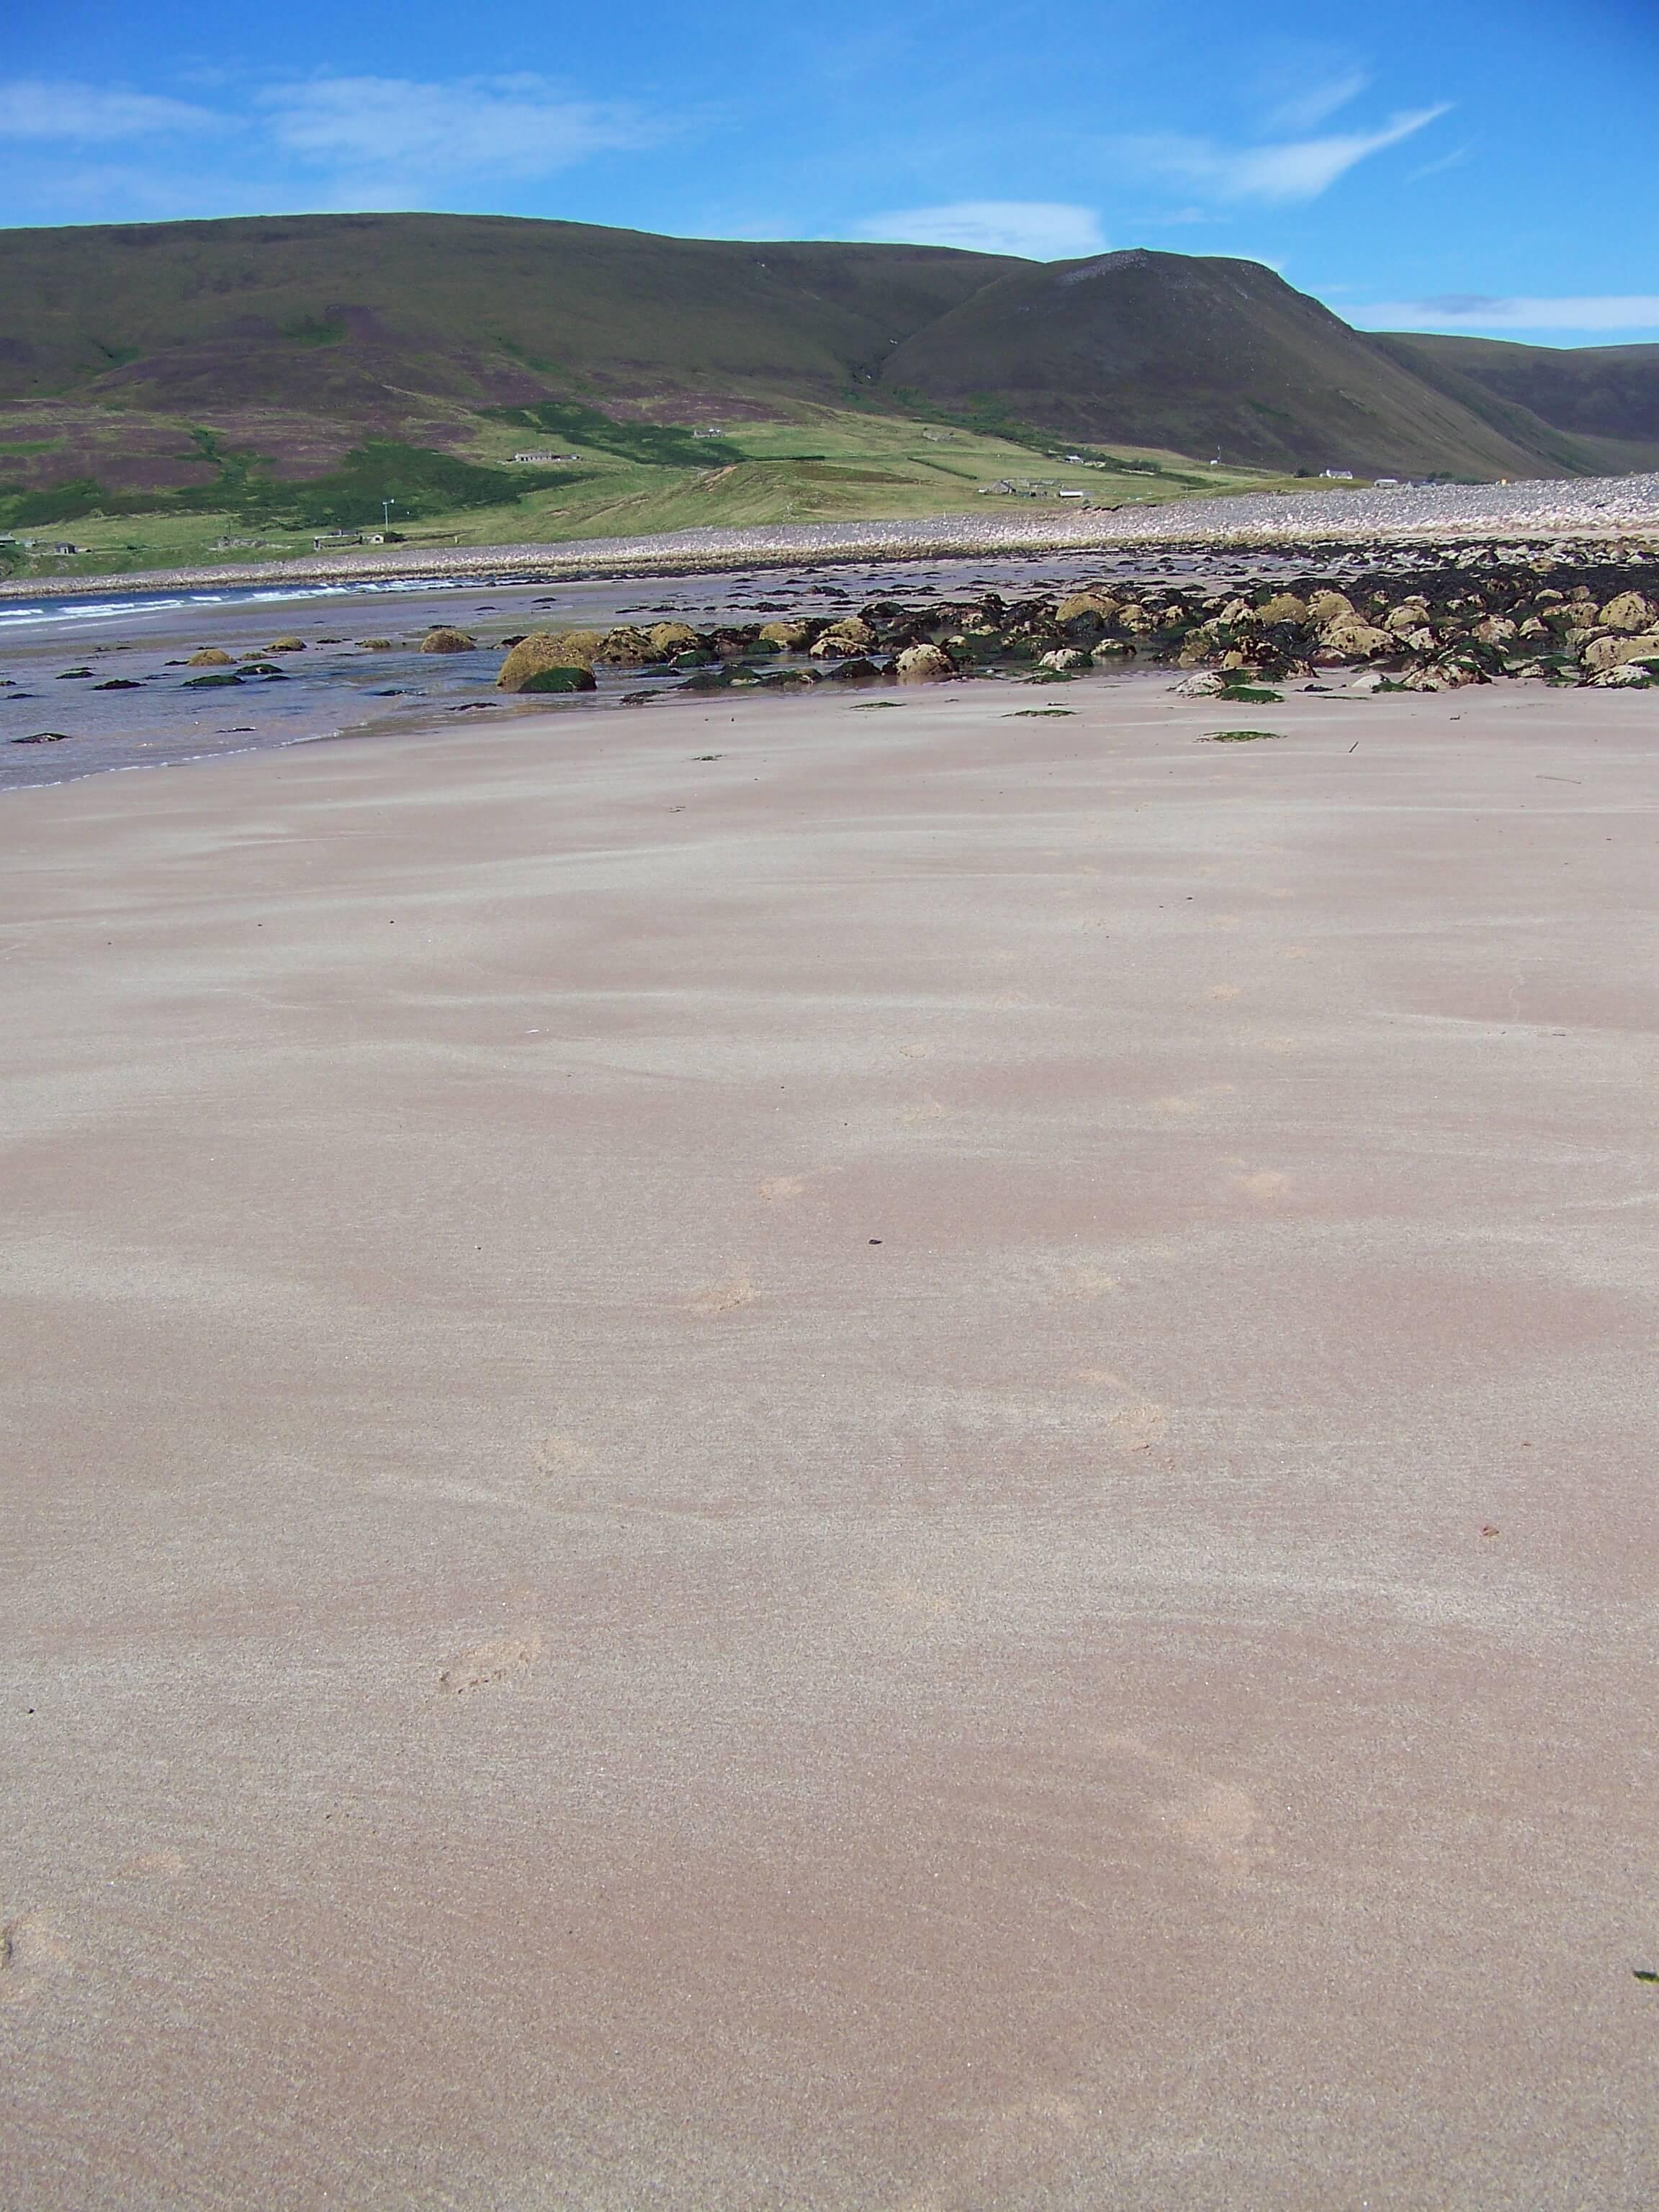 Pink sands of Rackwick Beach, Hoy, Orkney